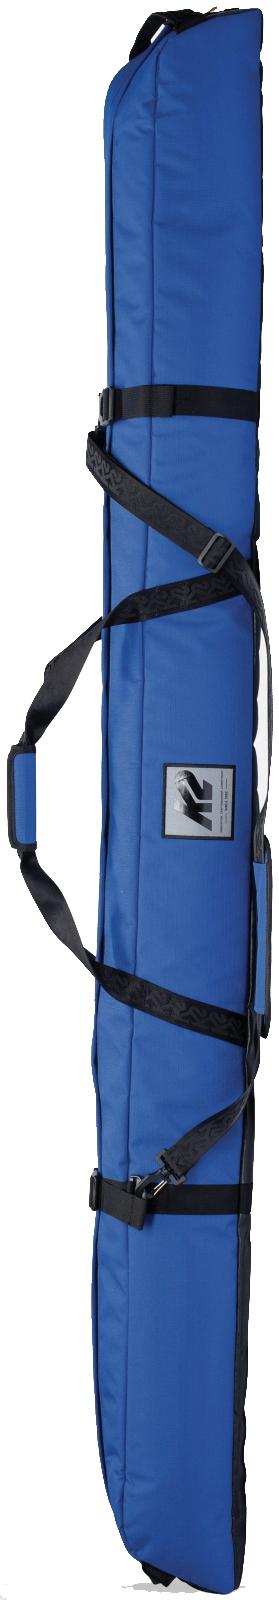 K2 K2 Single Padded Ski Bag - Blue 175 cm